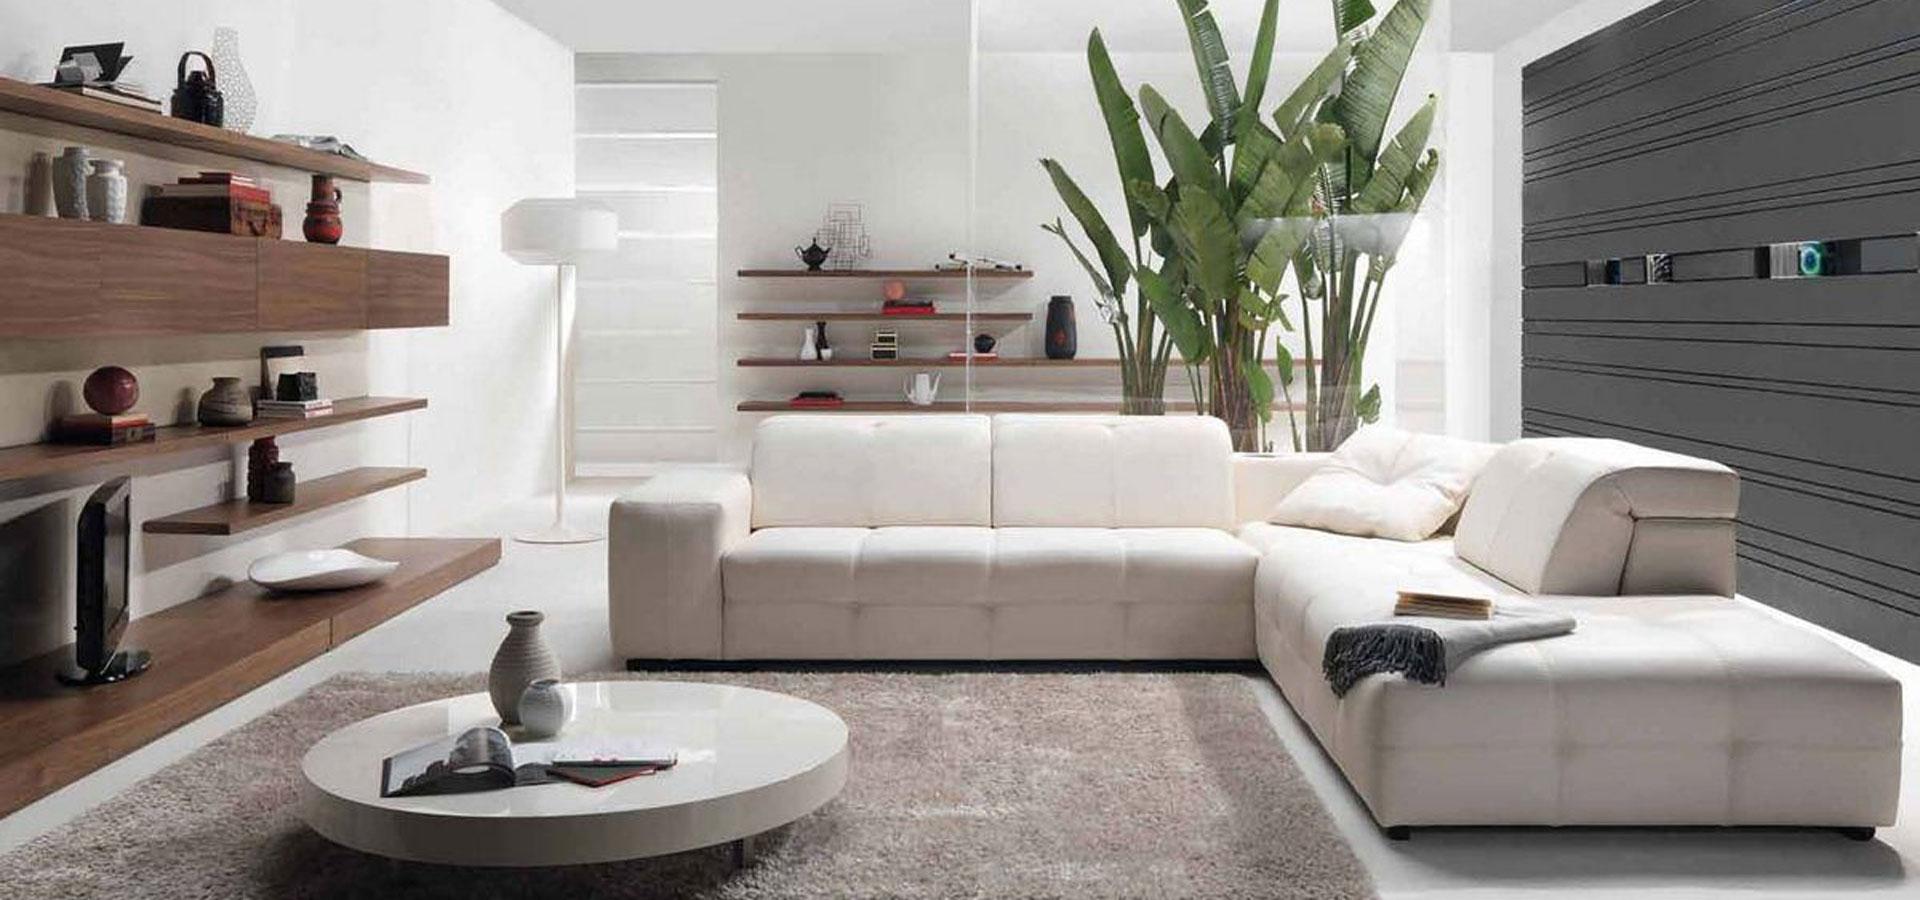 decorar 1a sala de estar moderna 10 ideas de diseño de interiores para tener una sala de estar moderna decorar 1